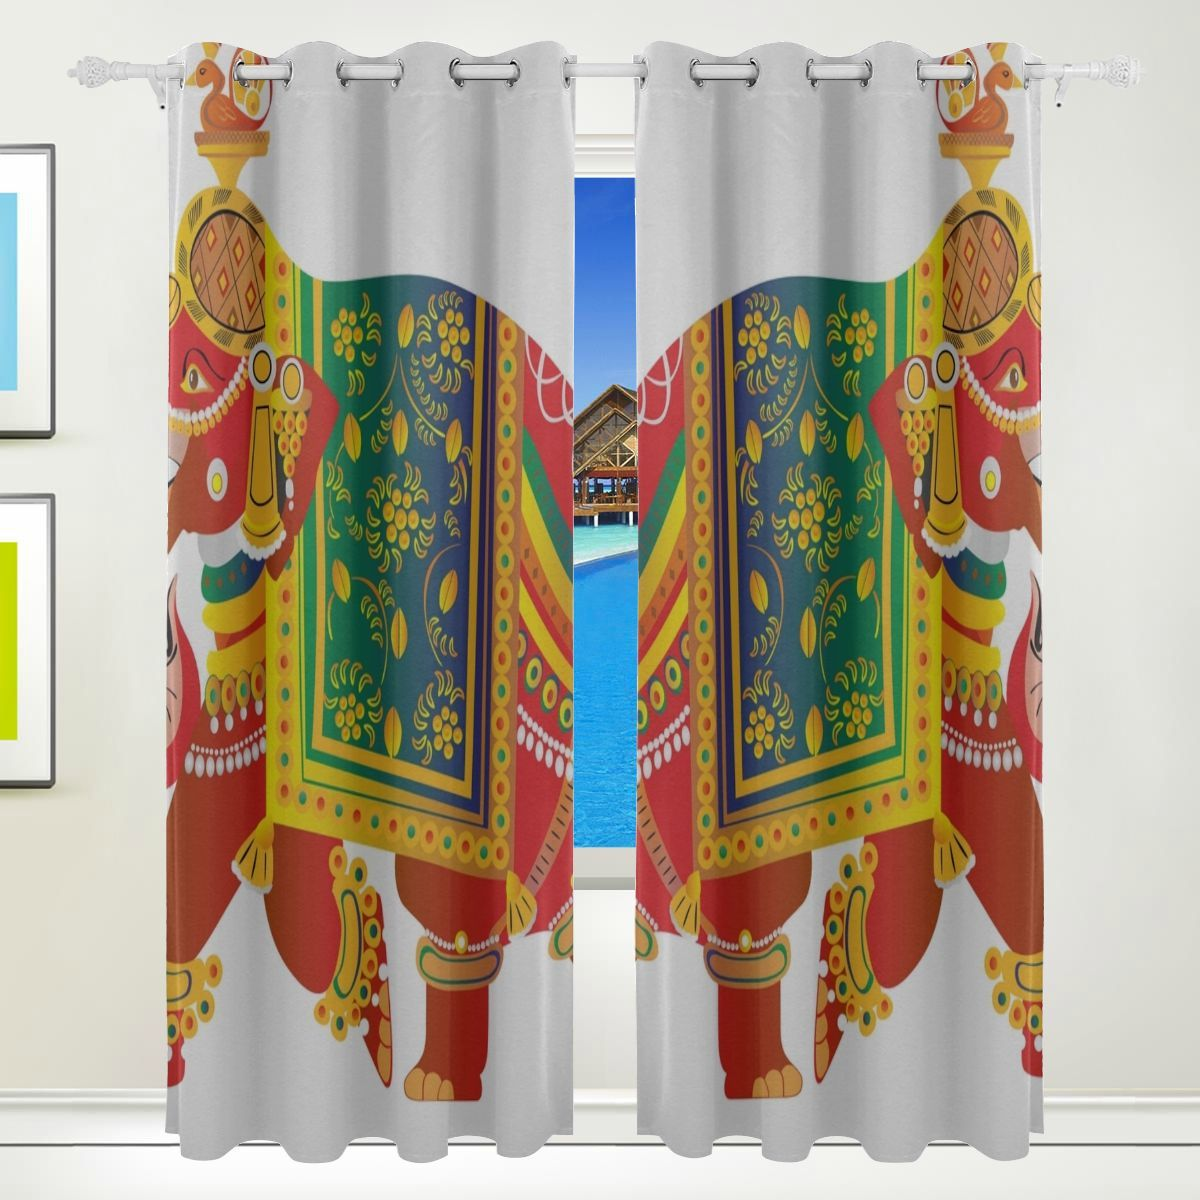 Cute Curtains Bedroom Tribal Elephant Ethnic Indian Animal